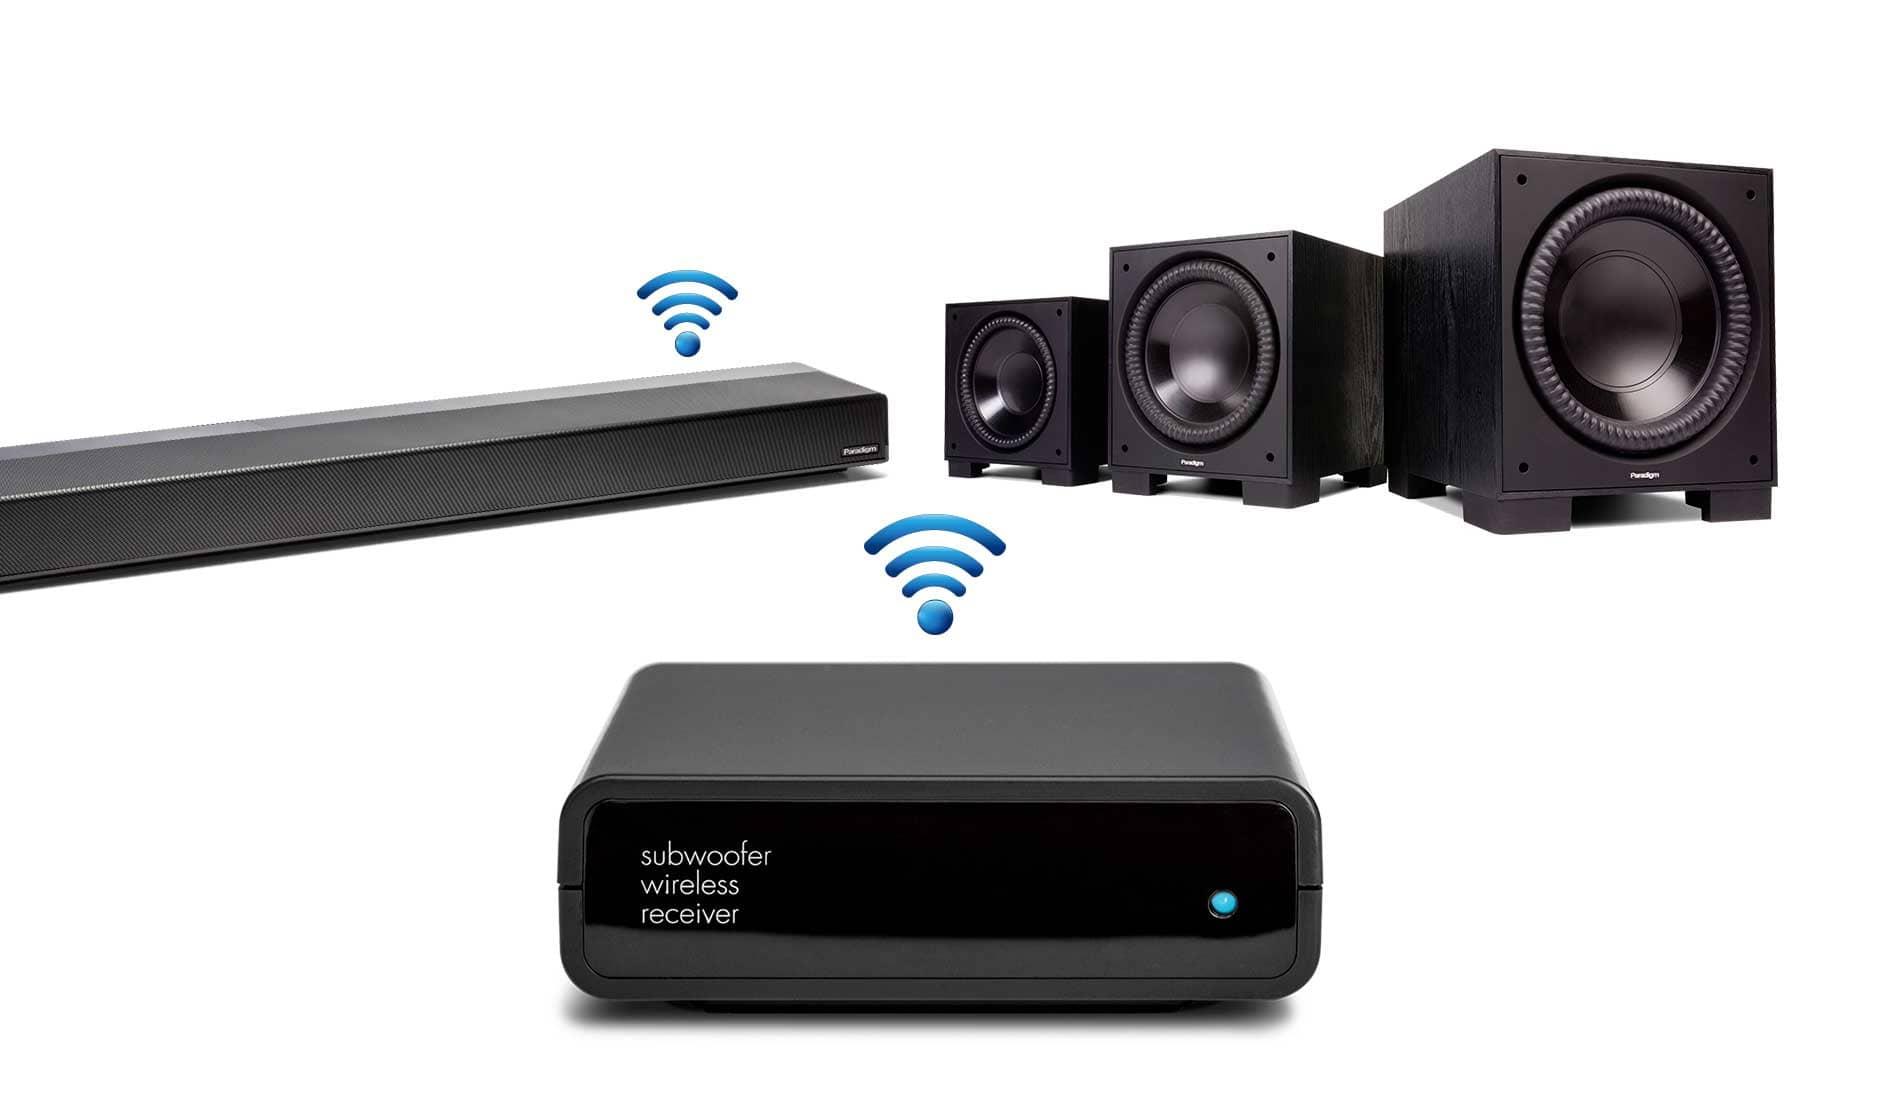 paradigm premium wireless series pw soundbar overview